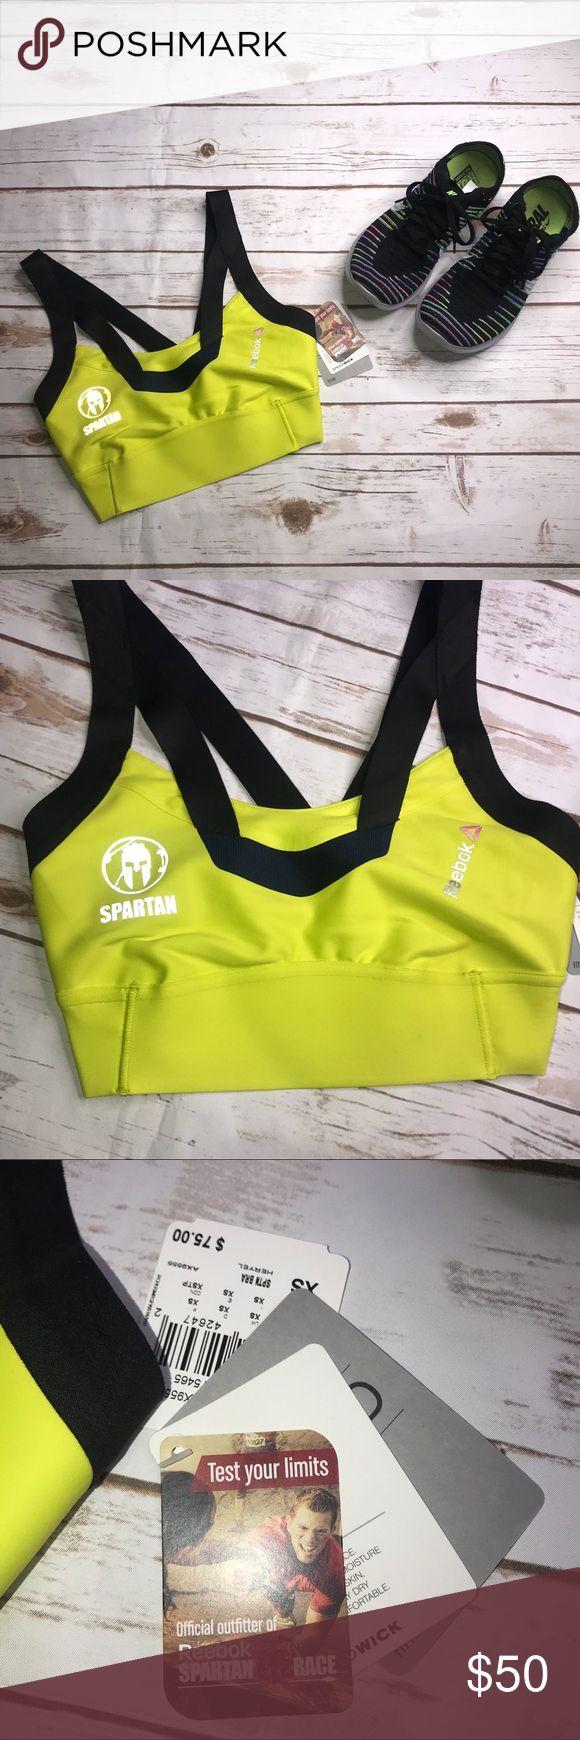 NWT: REEBOK SPARTAN • Neon Yellow Sports Bra - XS NEW WITH TAGS: REEBOK SPARTAN • Neon Yellow Sports Bra - Size XS. NO Flaws. (shoes not included) Reebok Intimates & Sleepwear Bras